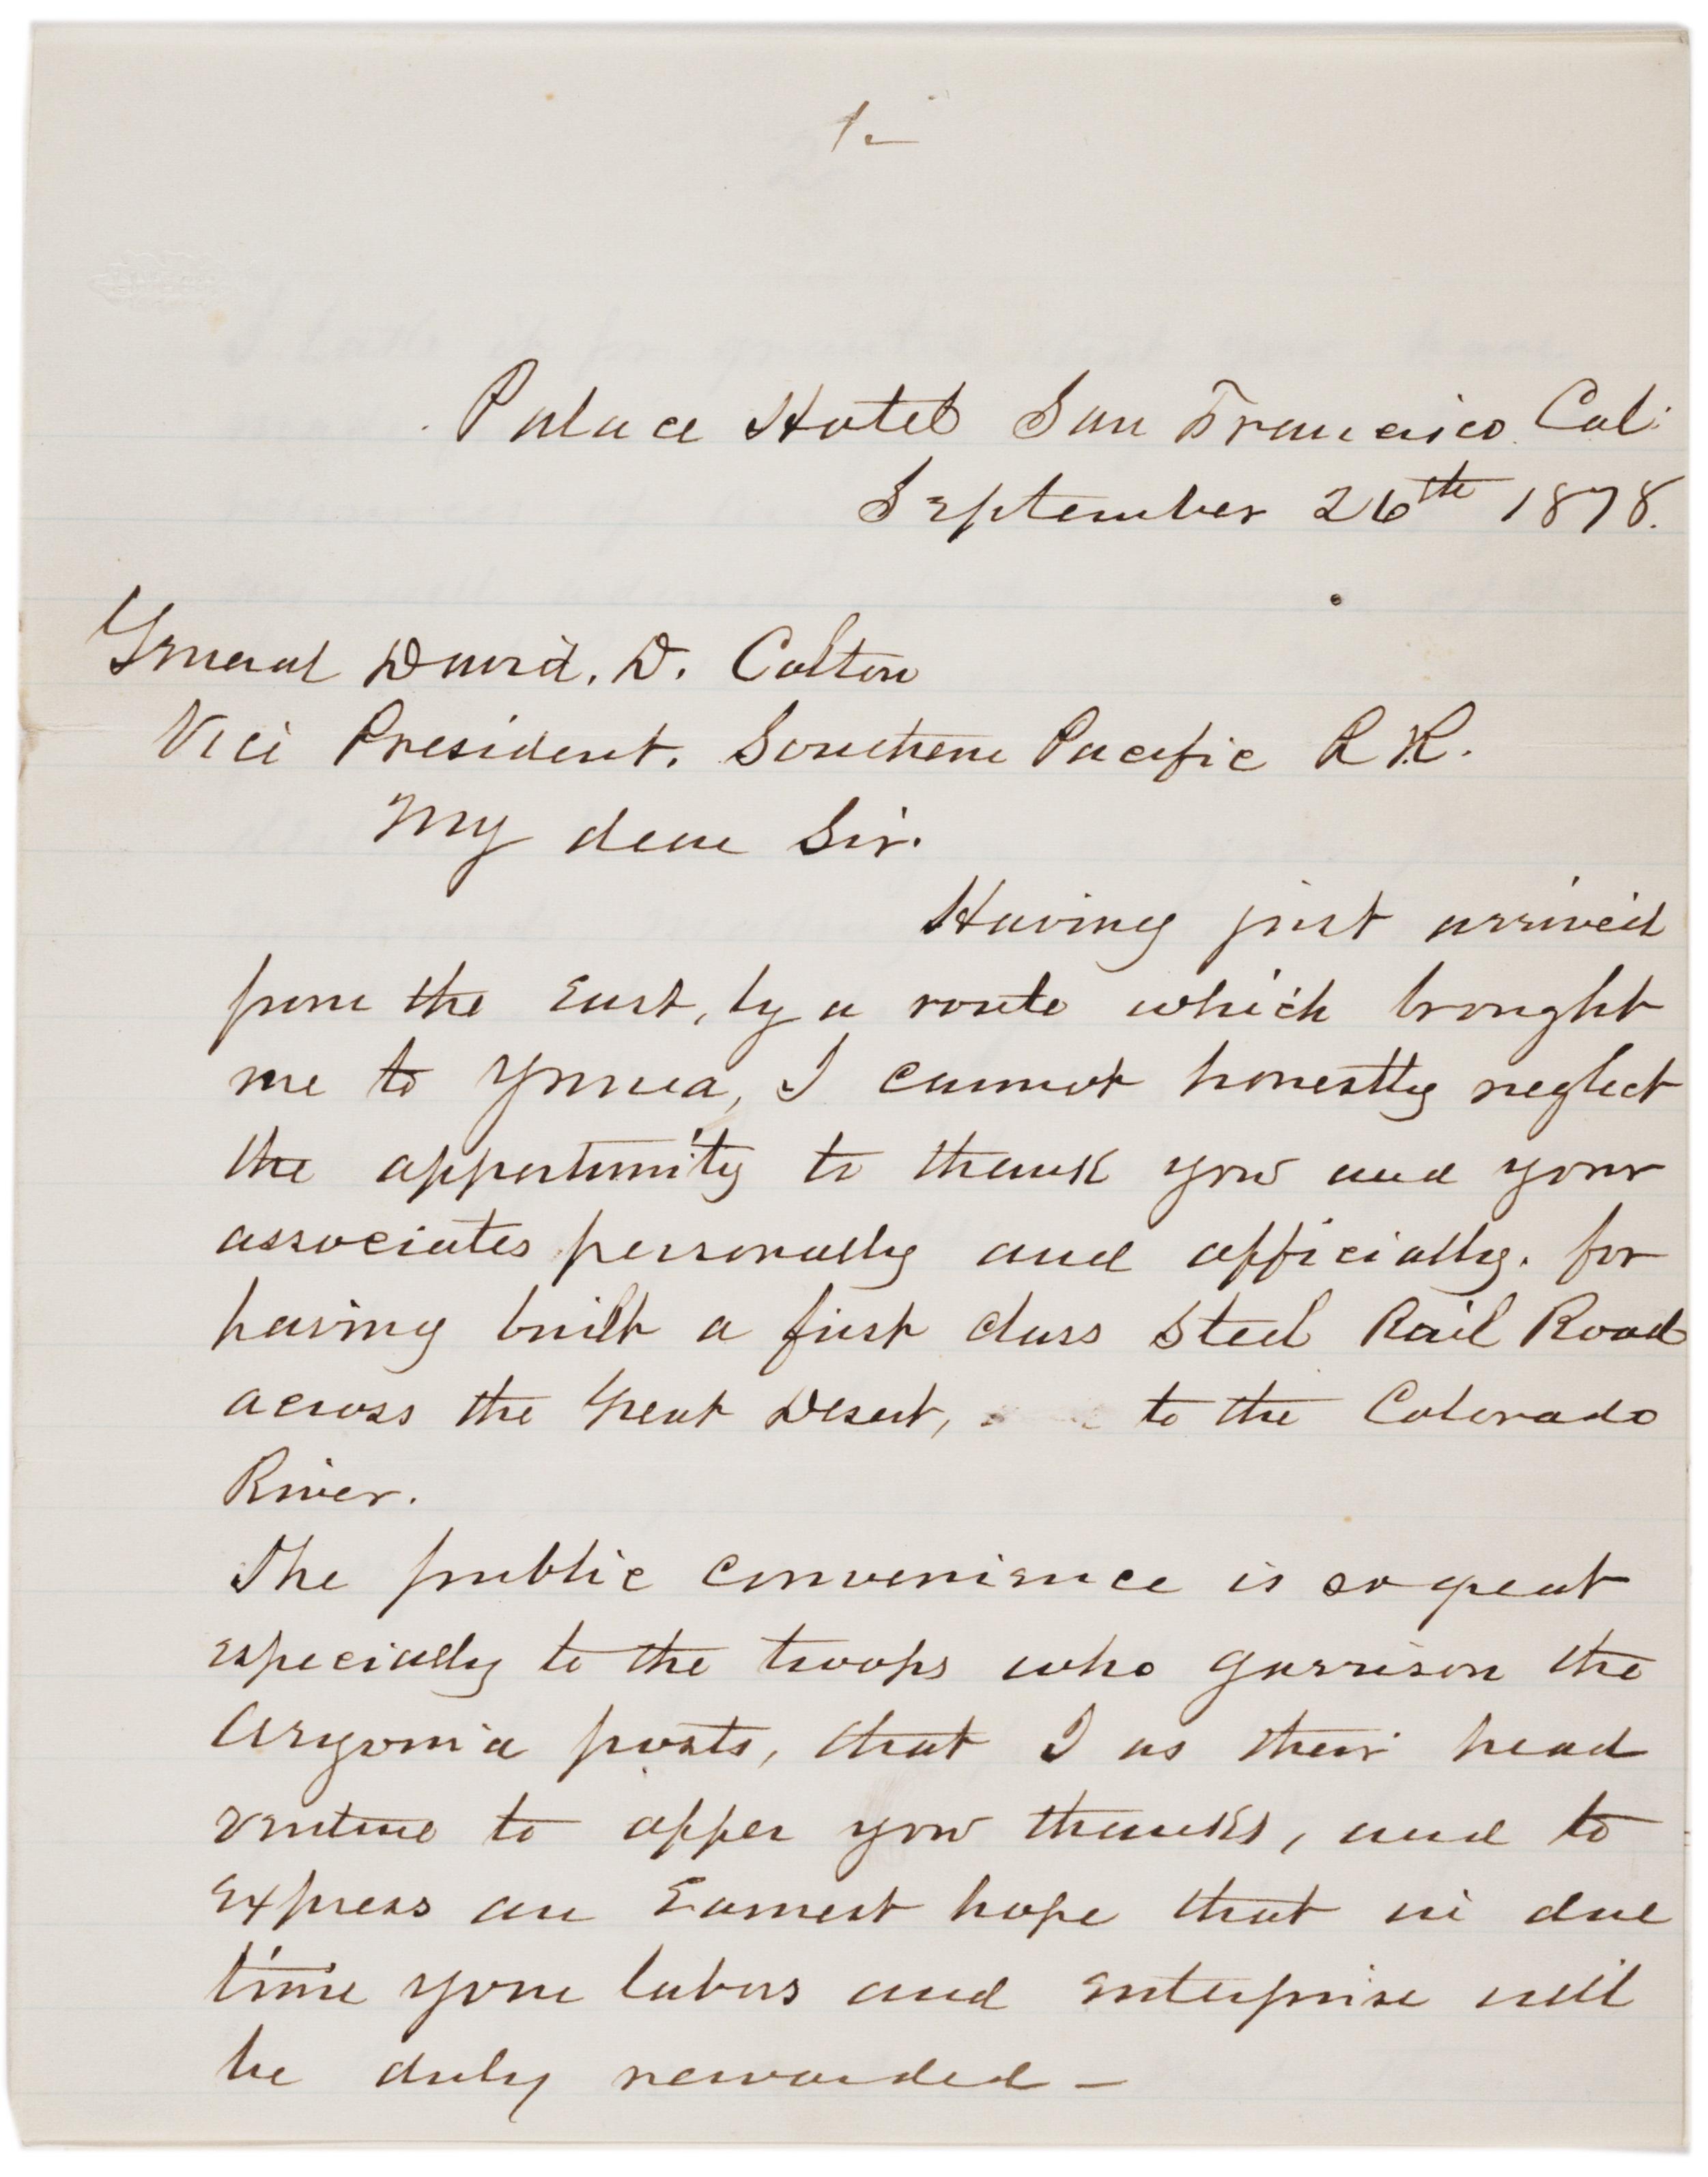 william tecumseh sherman essay William tecumseh sherman papers, 1850-1910 no date.